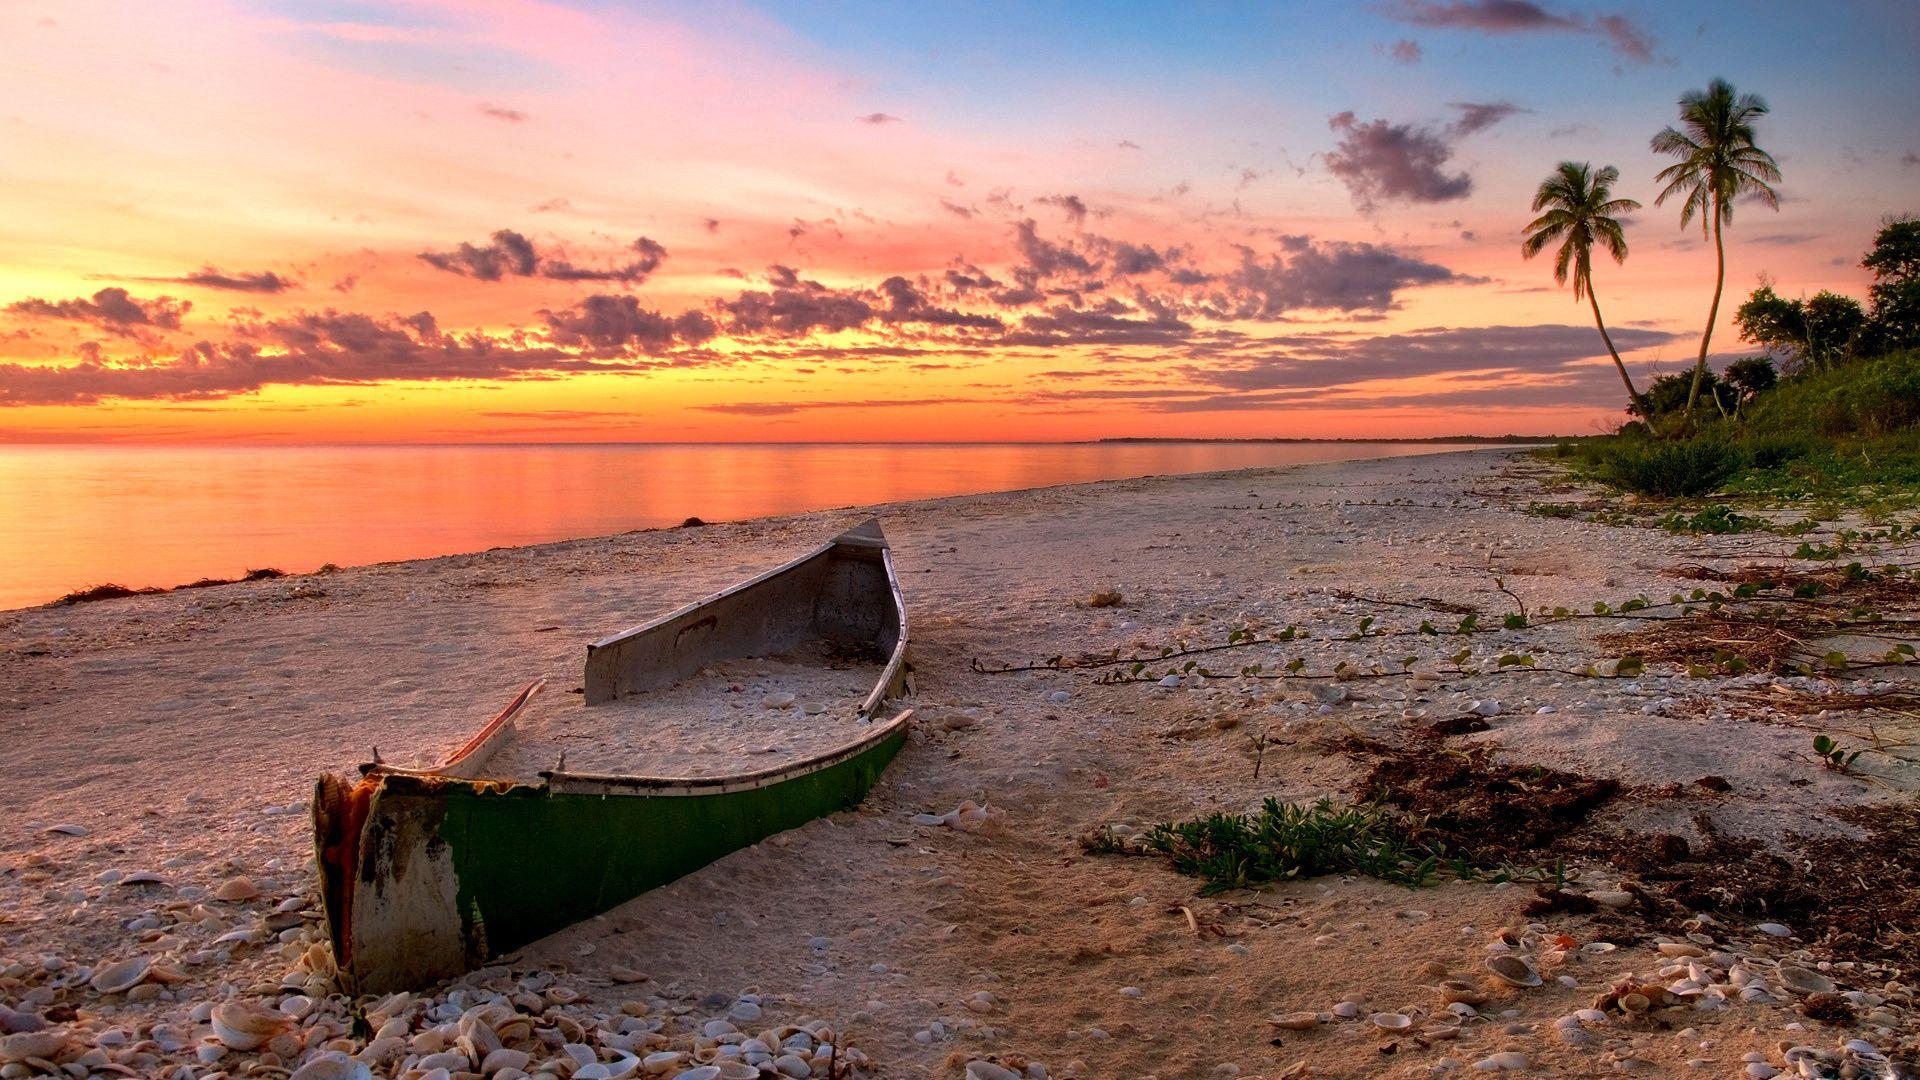 boat, beach, water